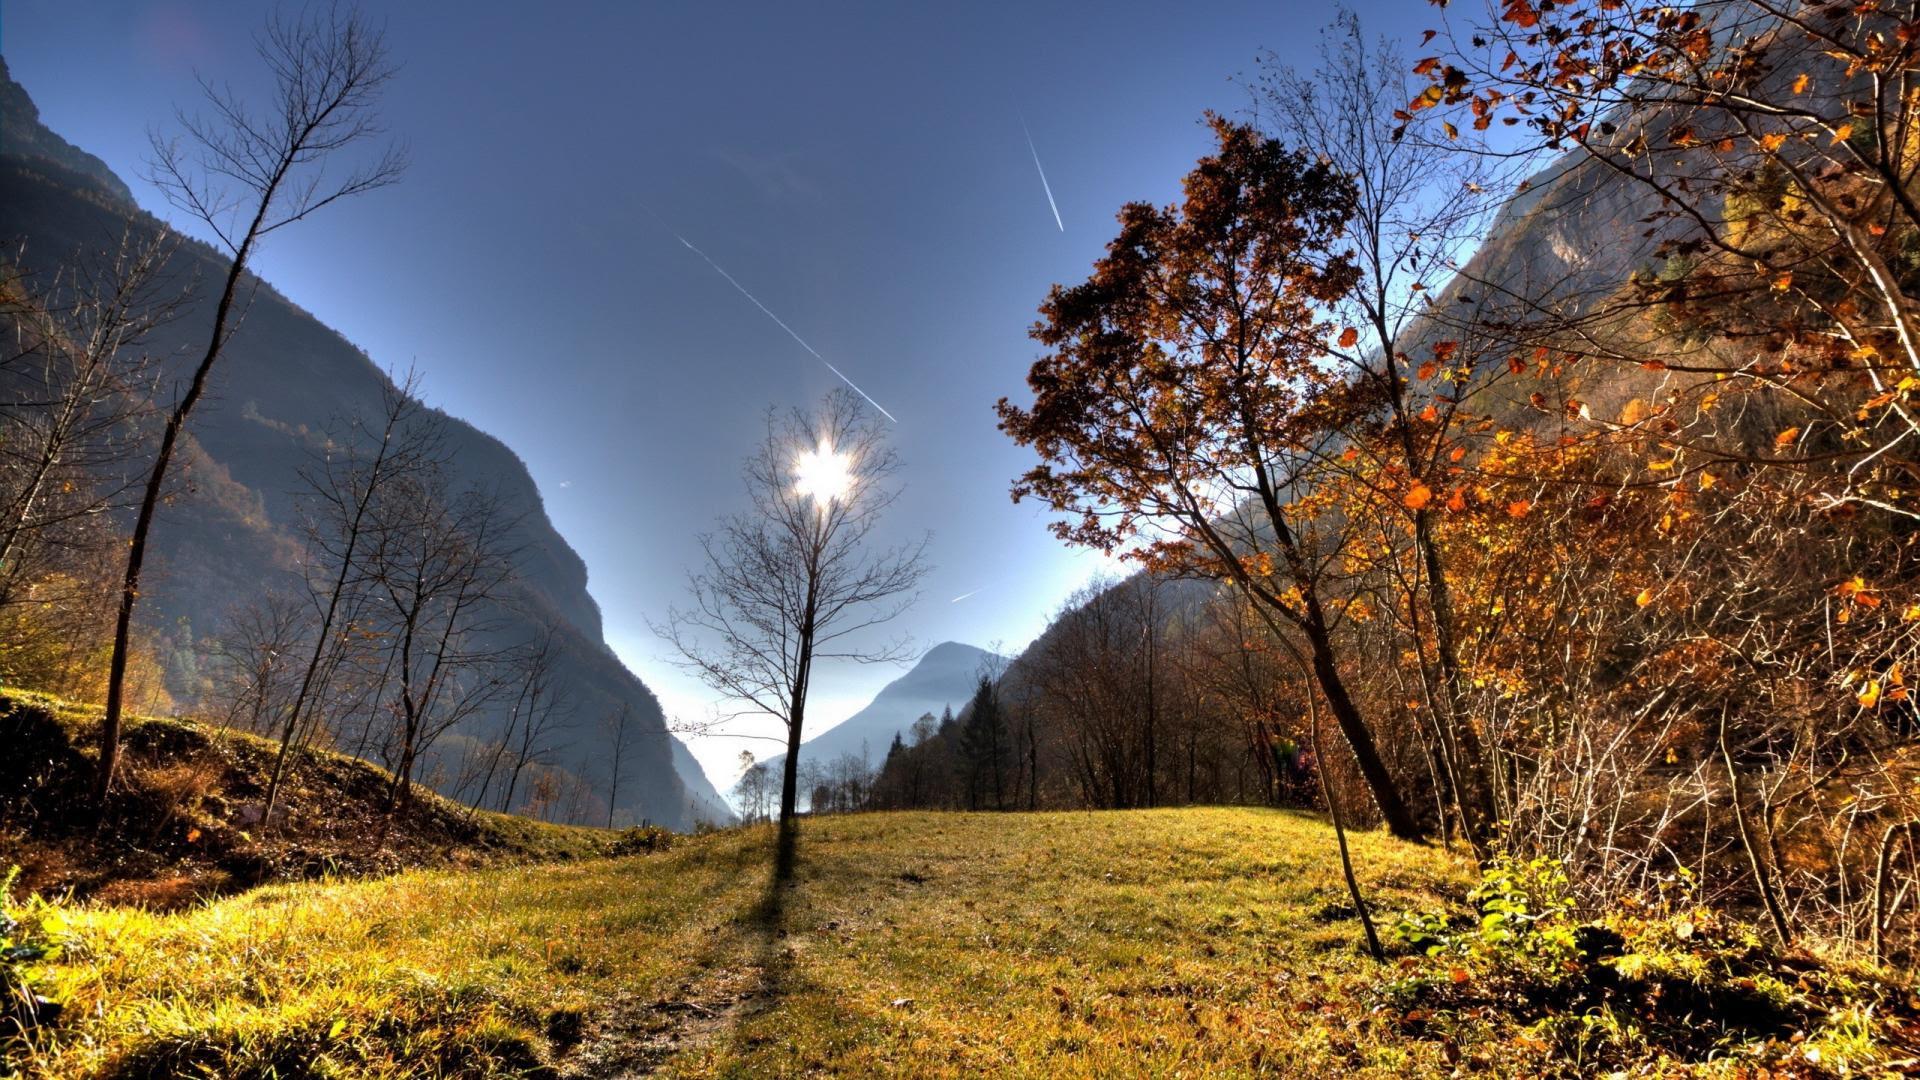 hdr nature backgrounds  HD Desktop Wallpapers  4k HD